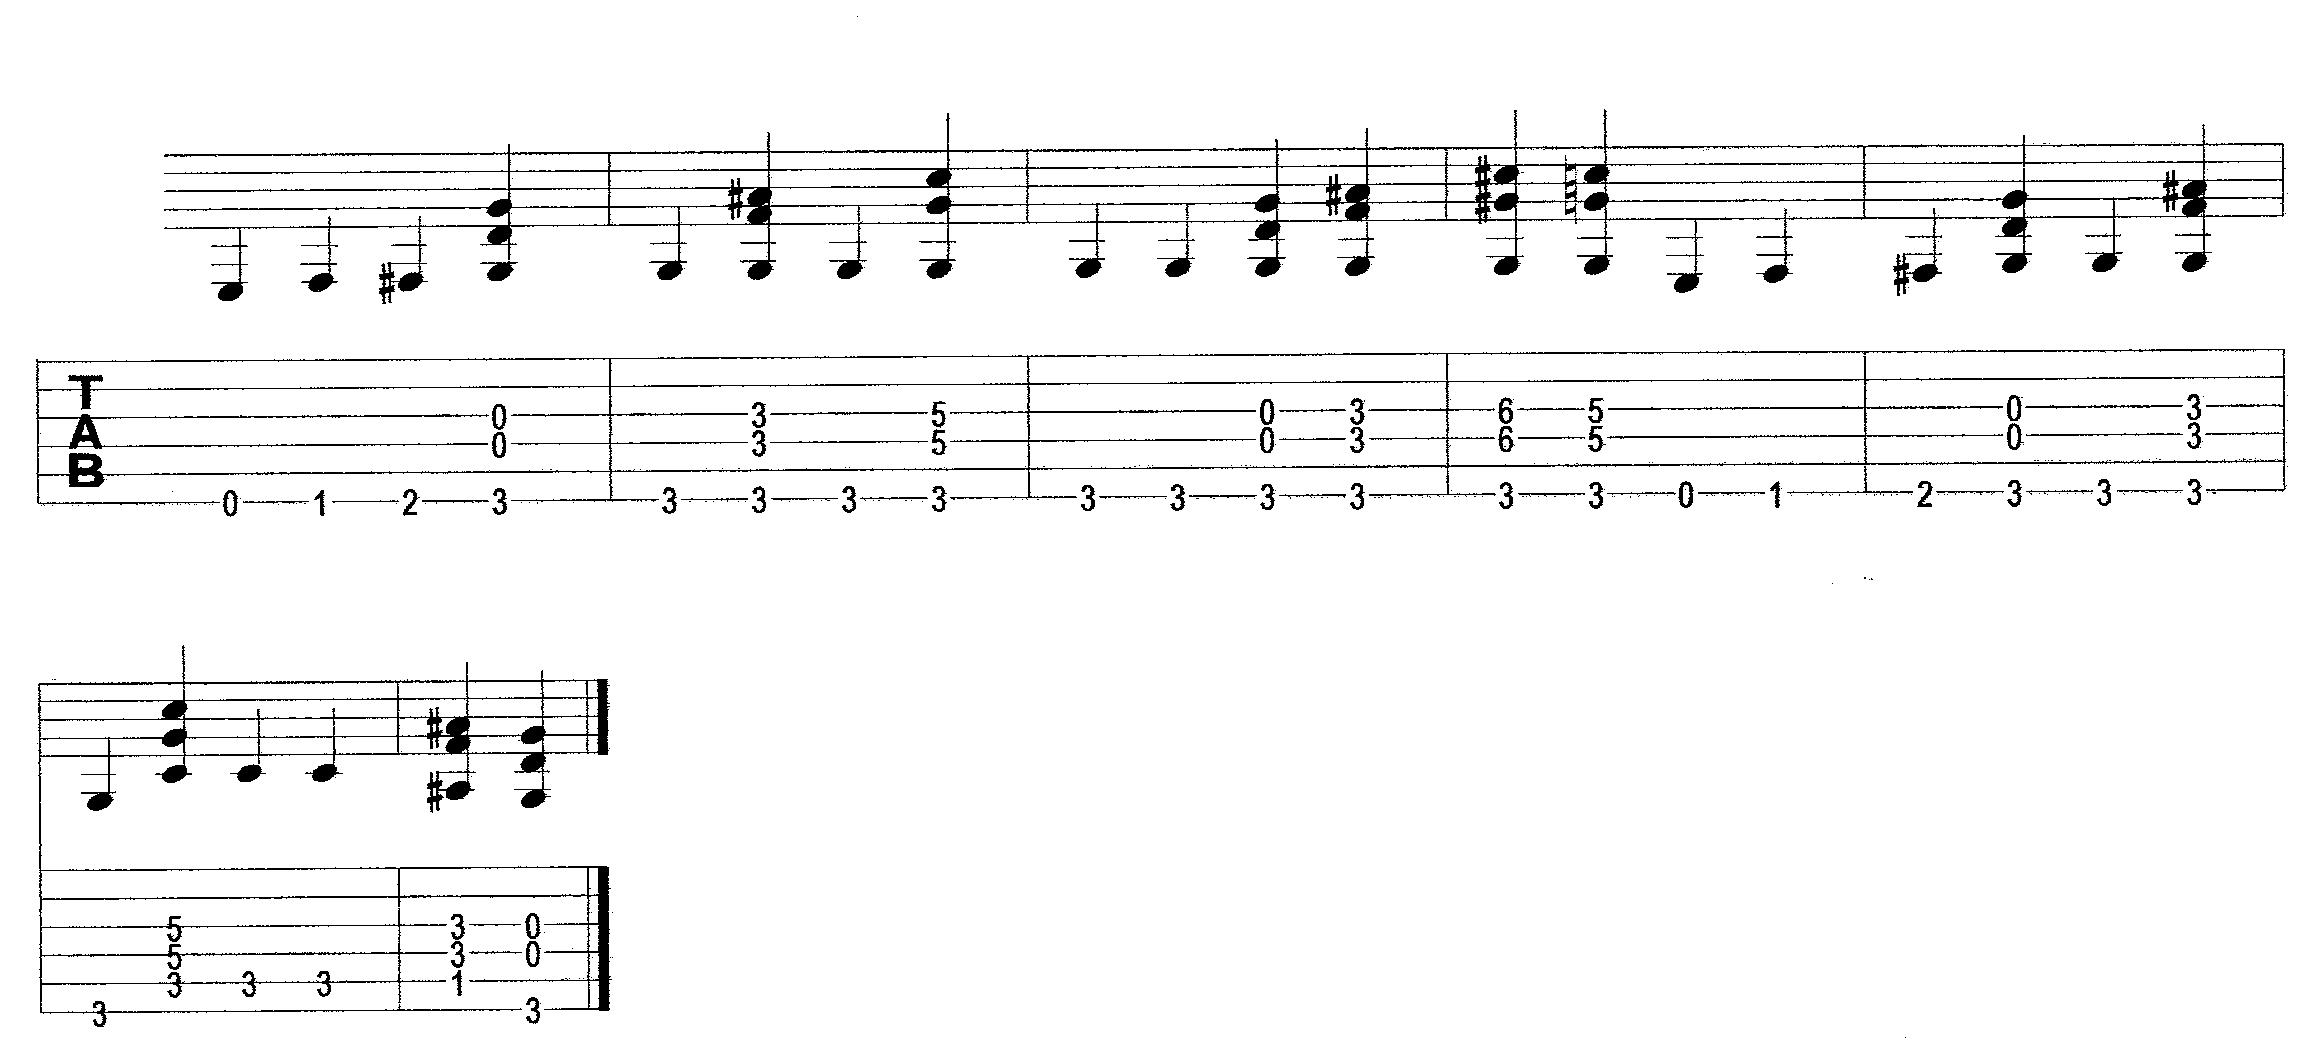 Simon and garfunkel sheet music guitar